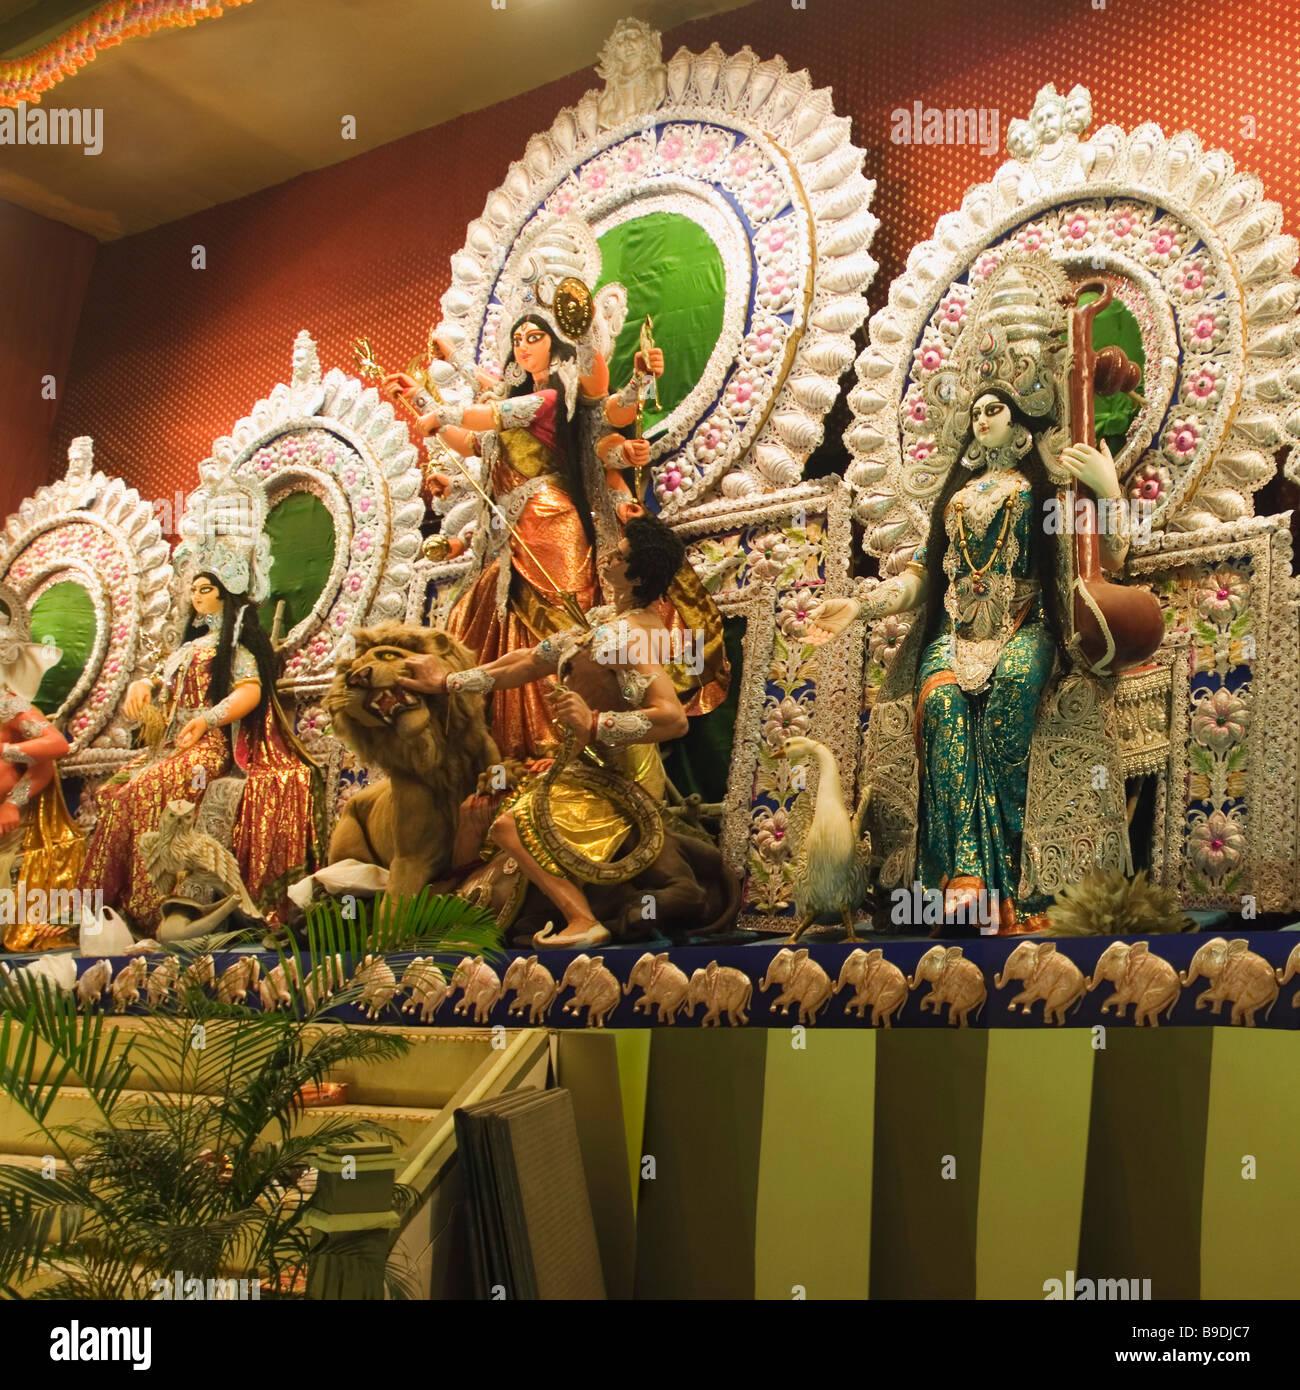 Goddess saraswati puja stock photos goddess saraswati puja stock statues of hindu gods in a durga puja pandal kolkata west bengal india altavistaventures Gallery